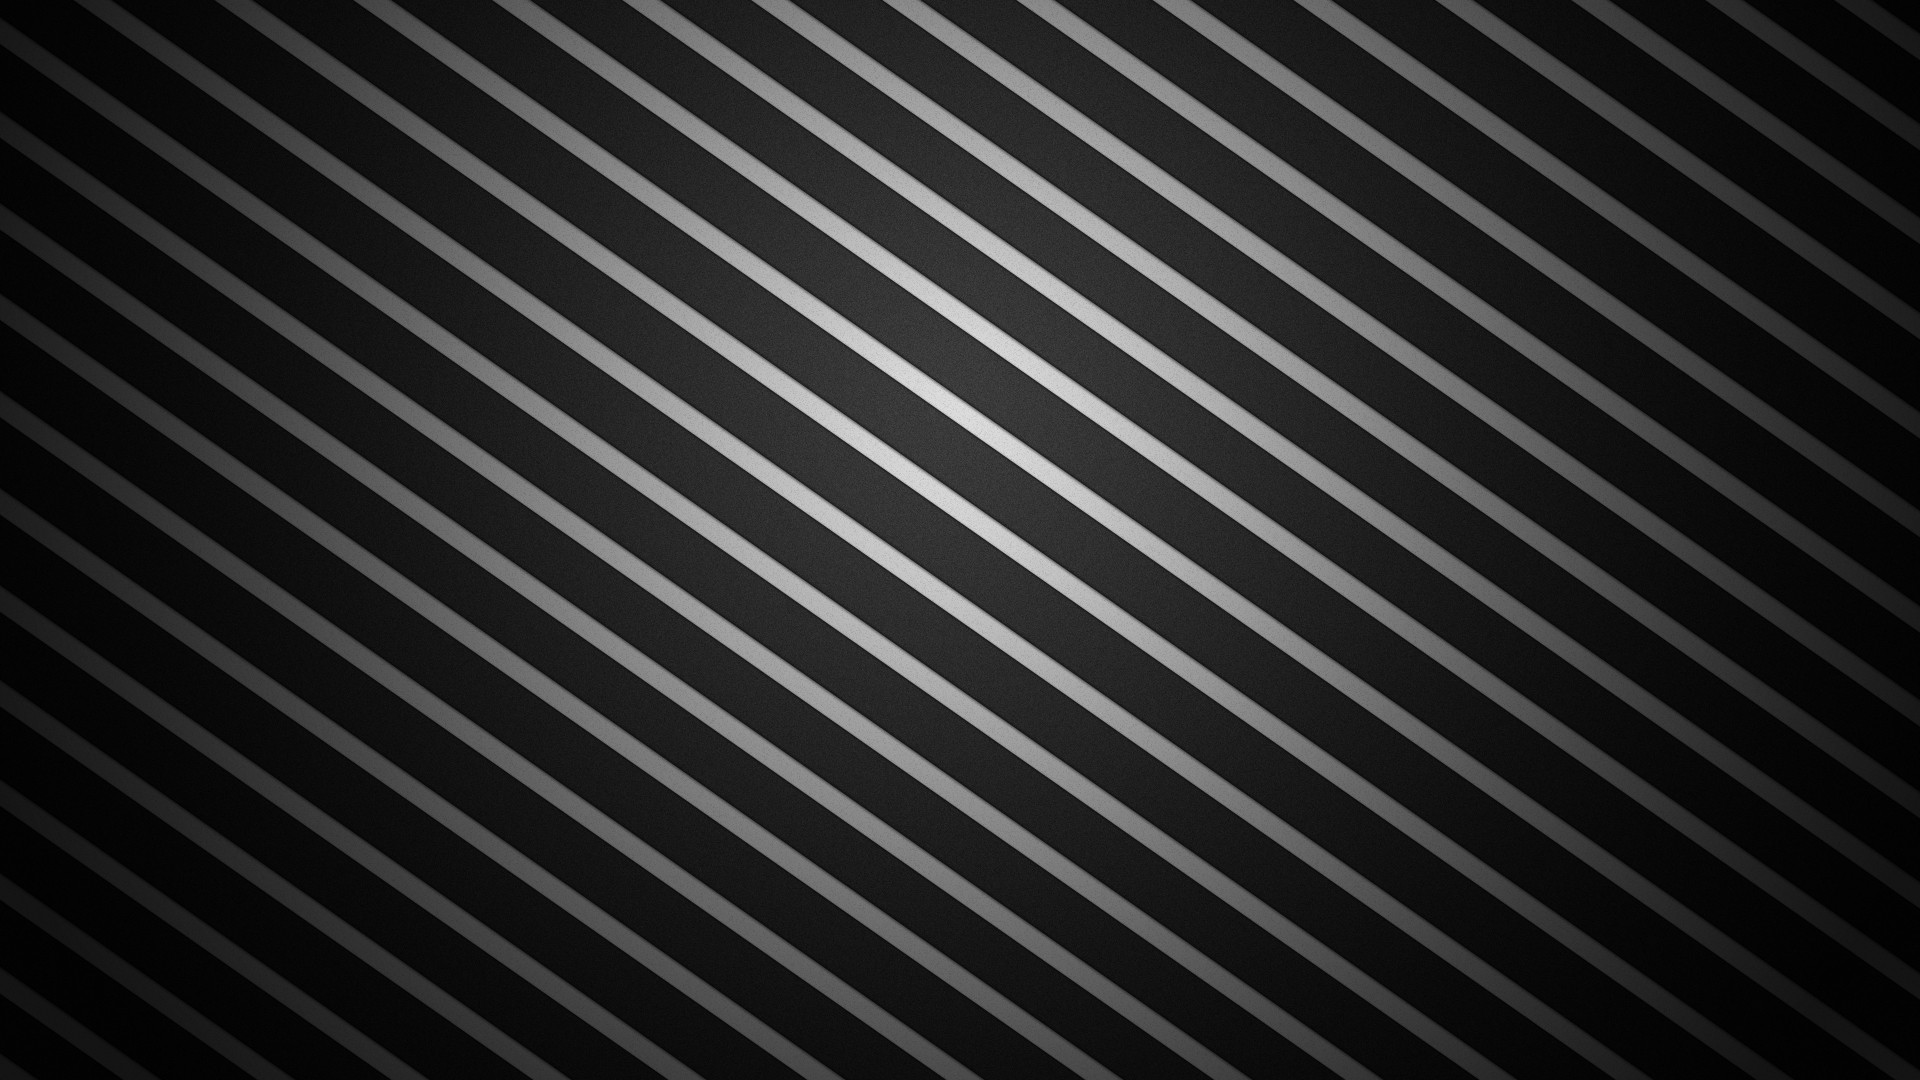 Striped Black Wallpaper